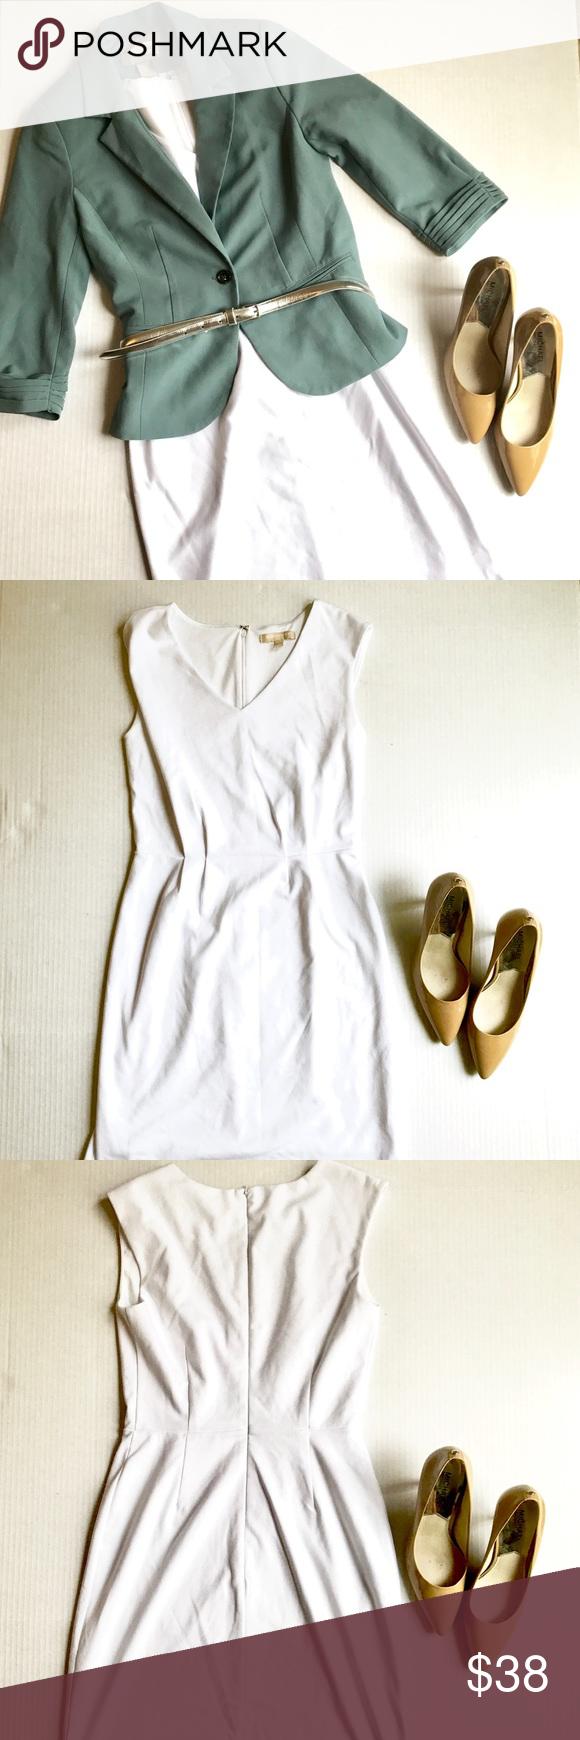 86ef61ec87f ❗️FLASH SALE❗️Banana Republic White Dress Perfect   professional midi fit.  US Women s Size 2. Pure white